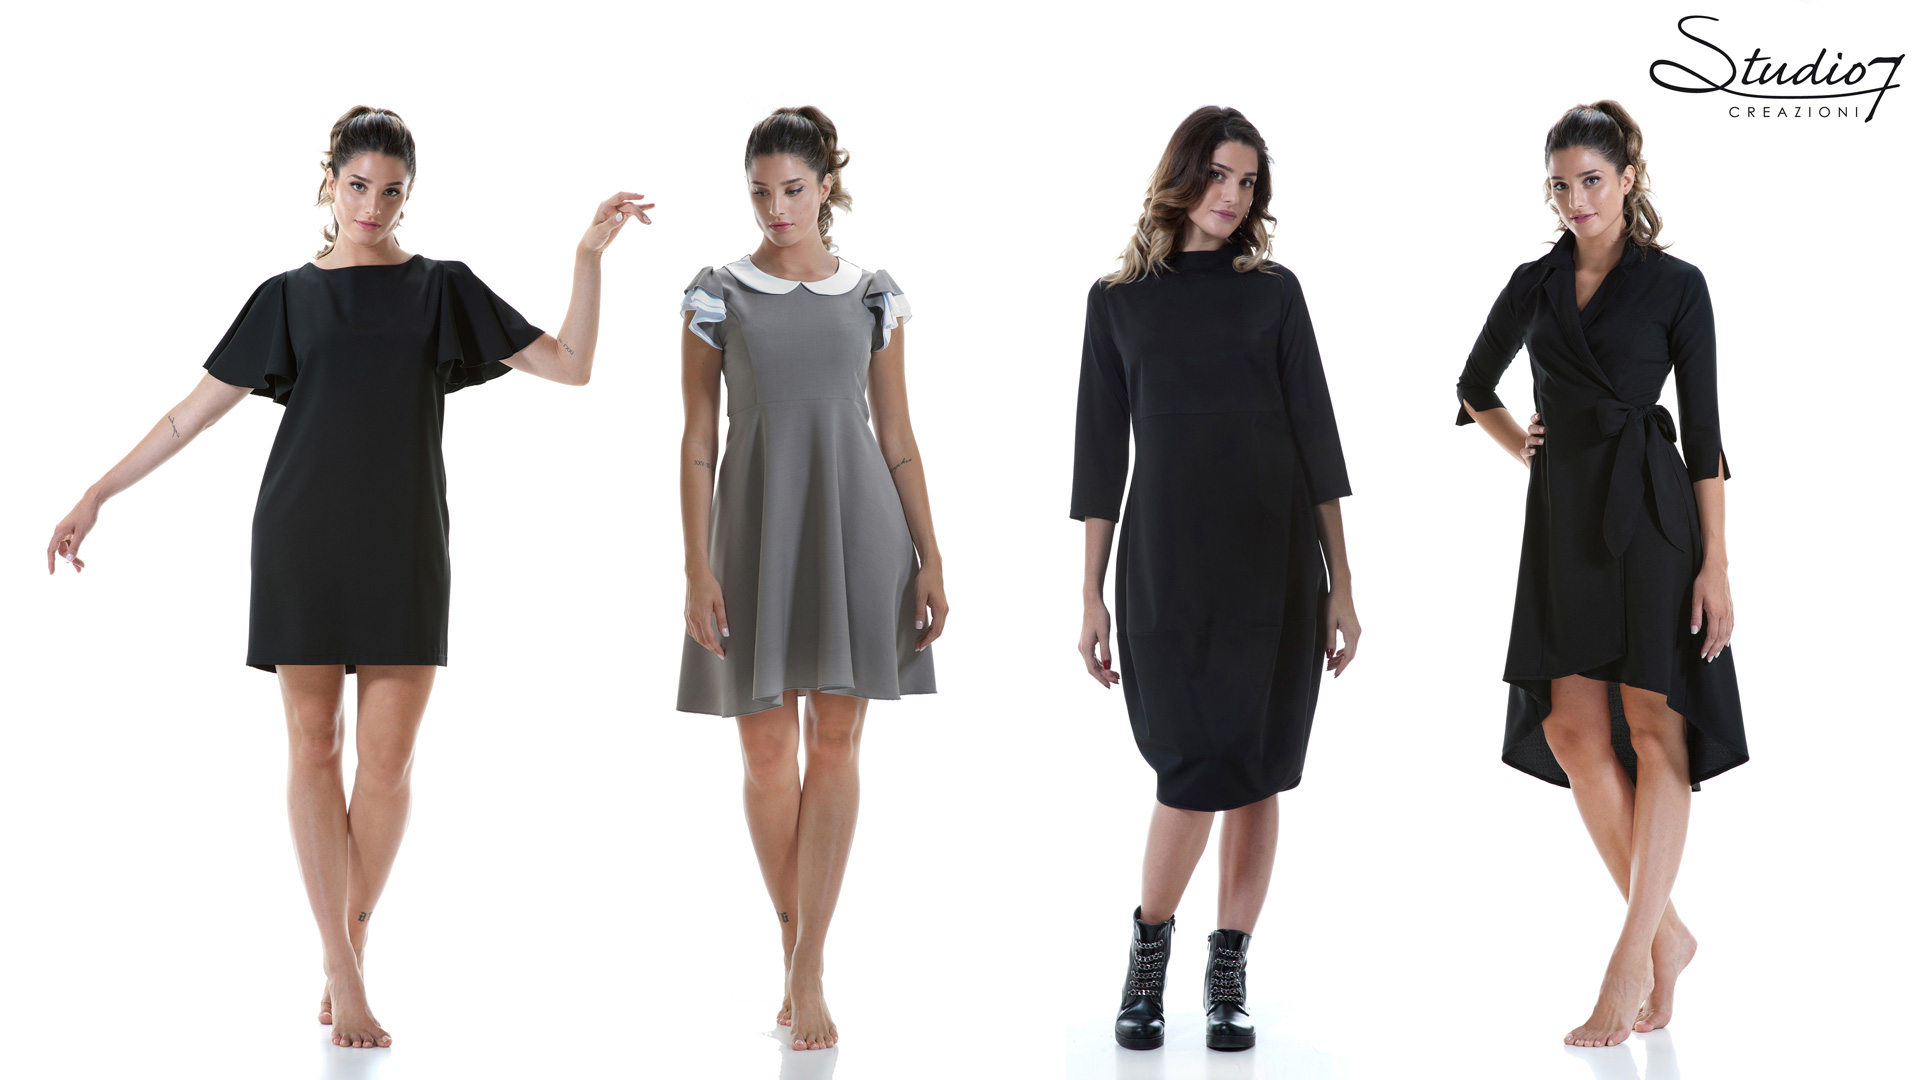 Dresses and mini-dresses for female staff